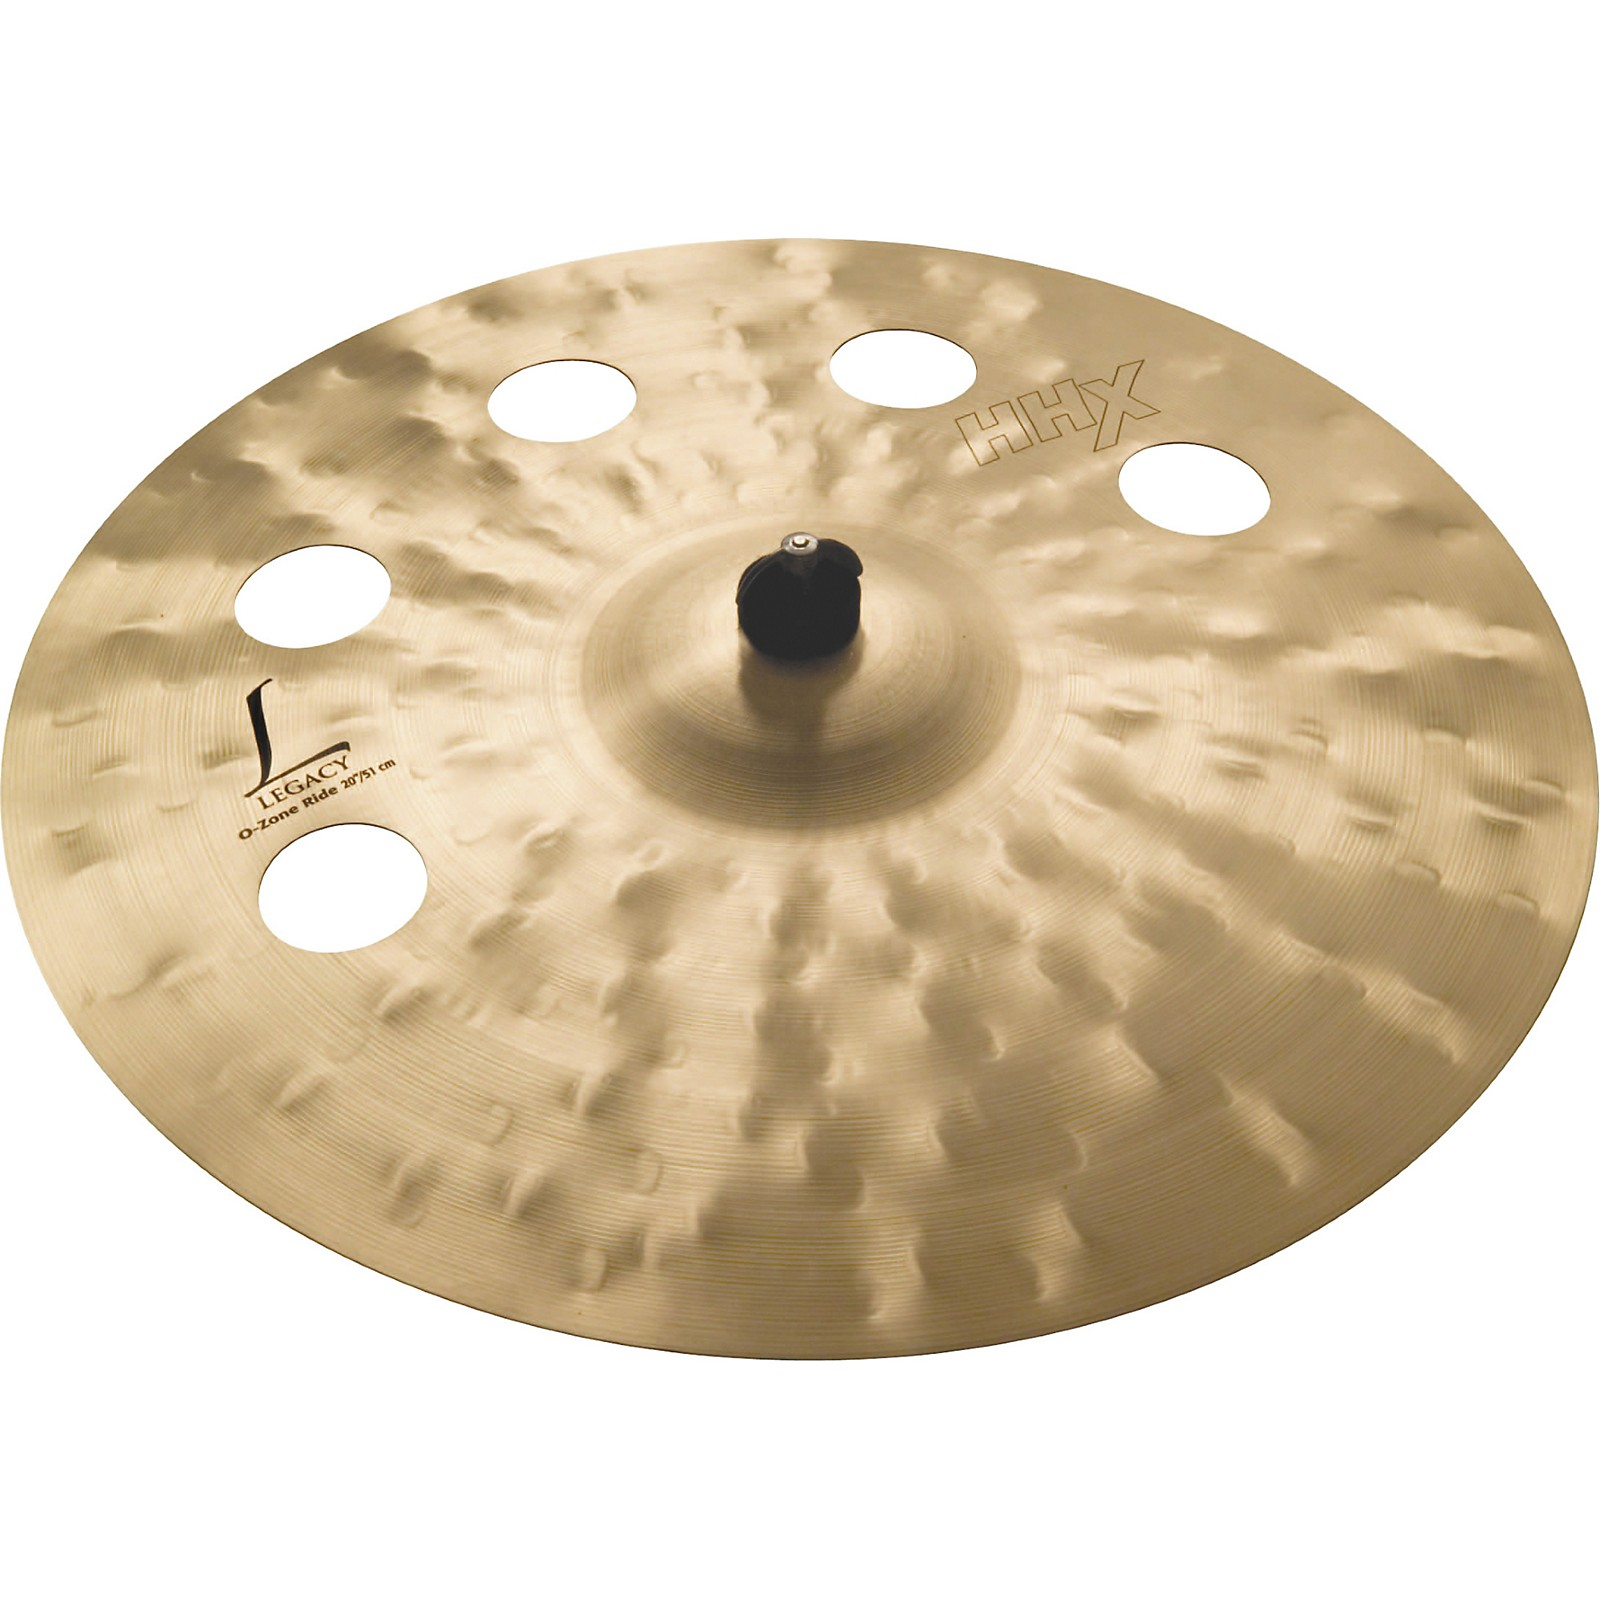 Sabian Legacy O-Zone Ride Cymbal